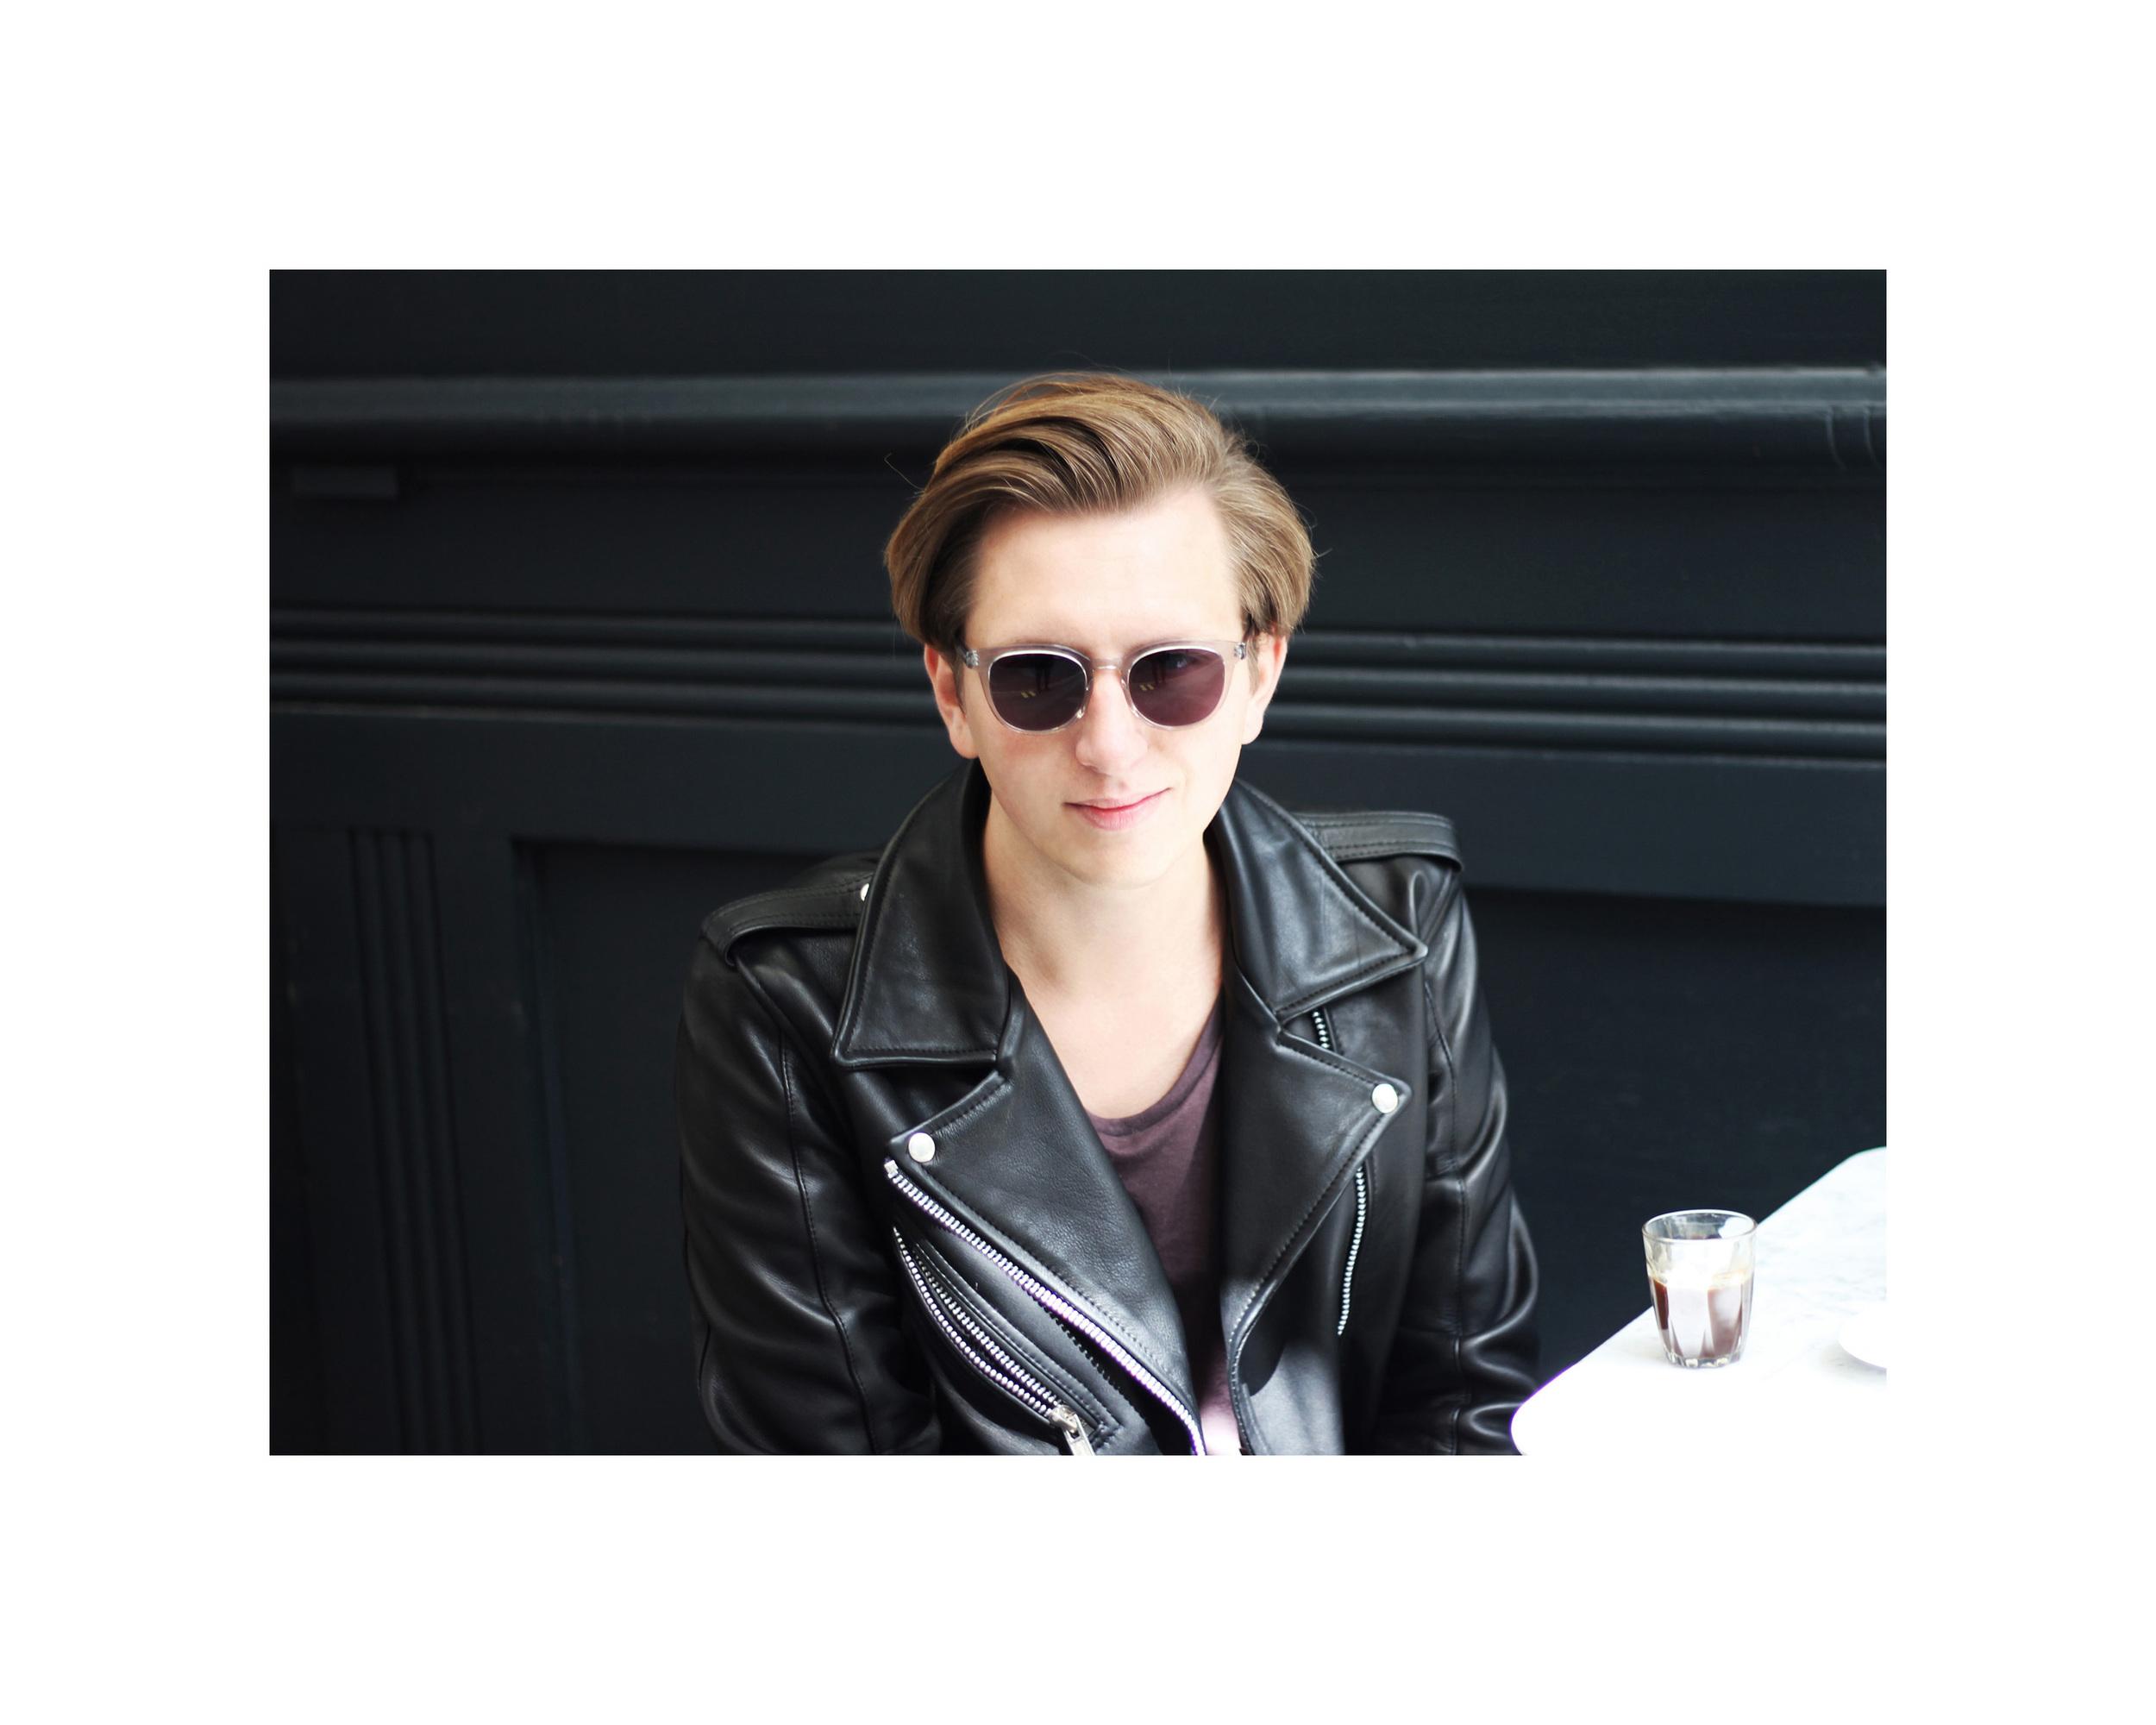 leather_jacket_cofee_brunch